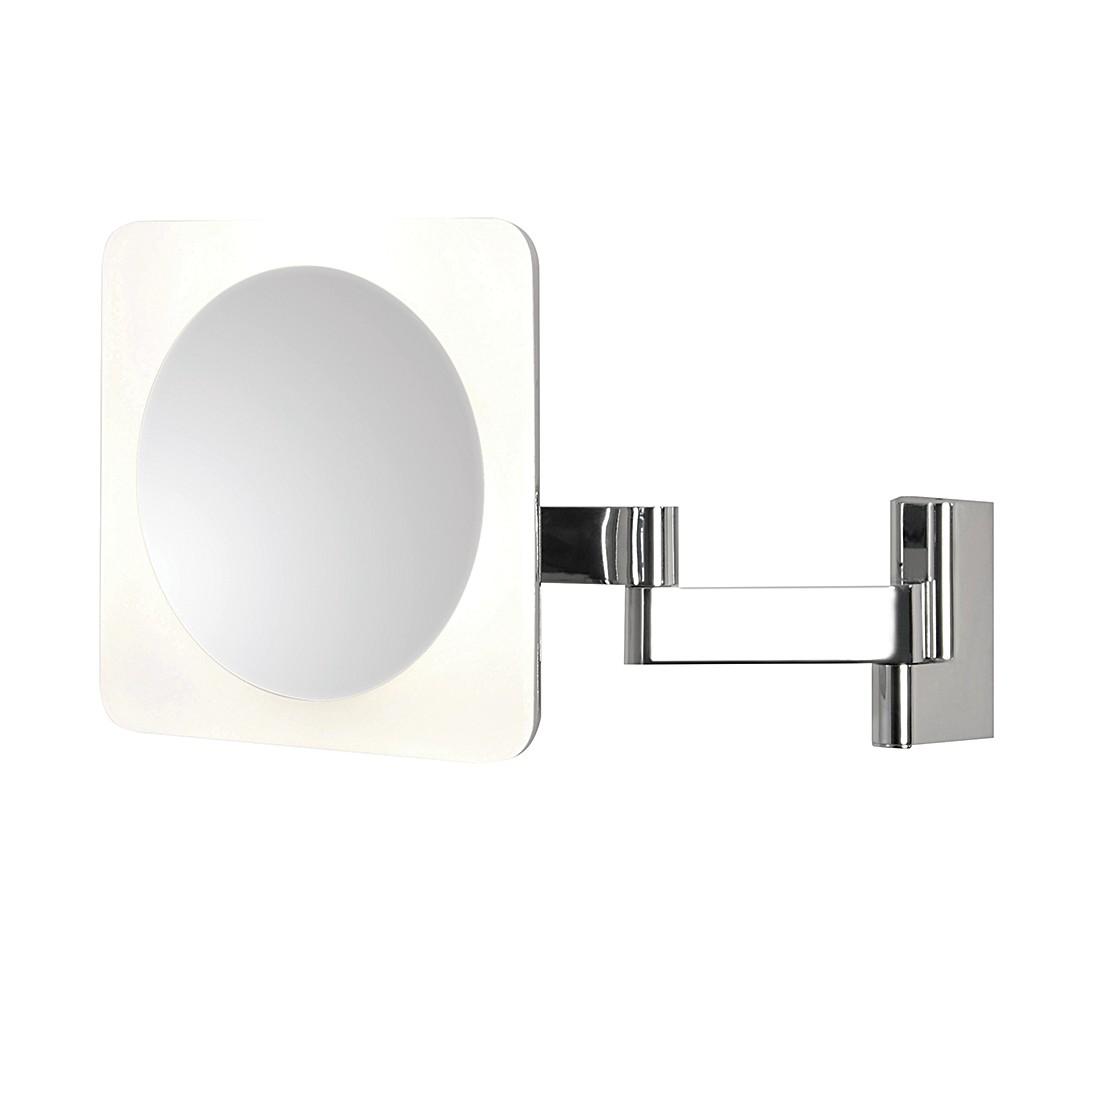 EEK A+, Kosmetikspiegel Niimi Square – Chrom – 4-flammig, Astro online bestellen